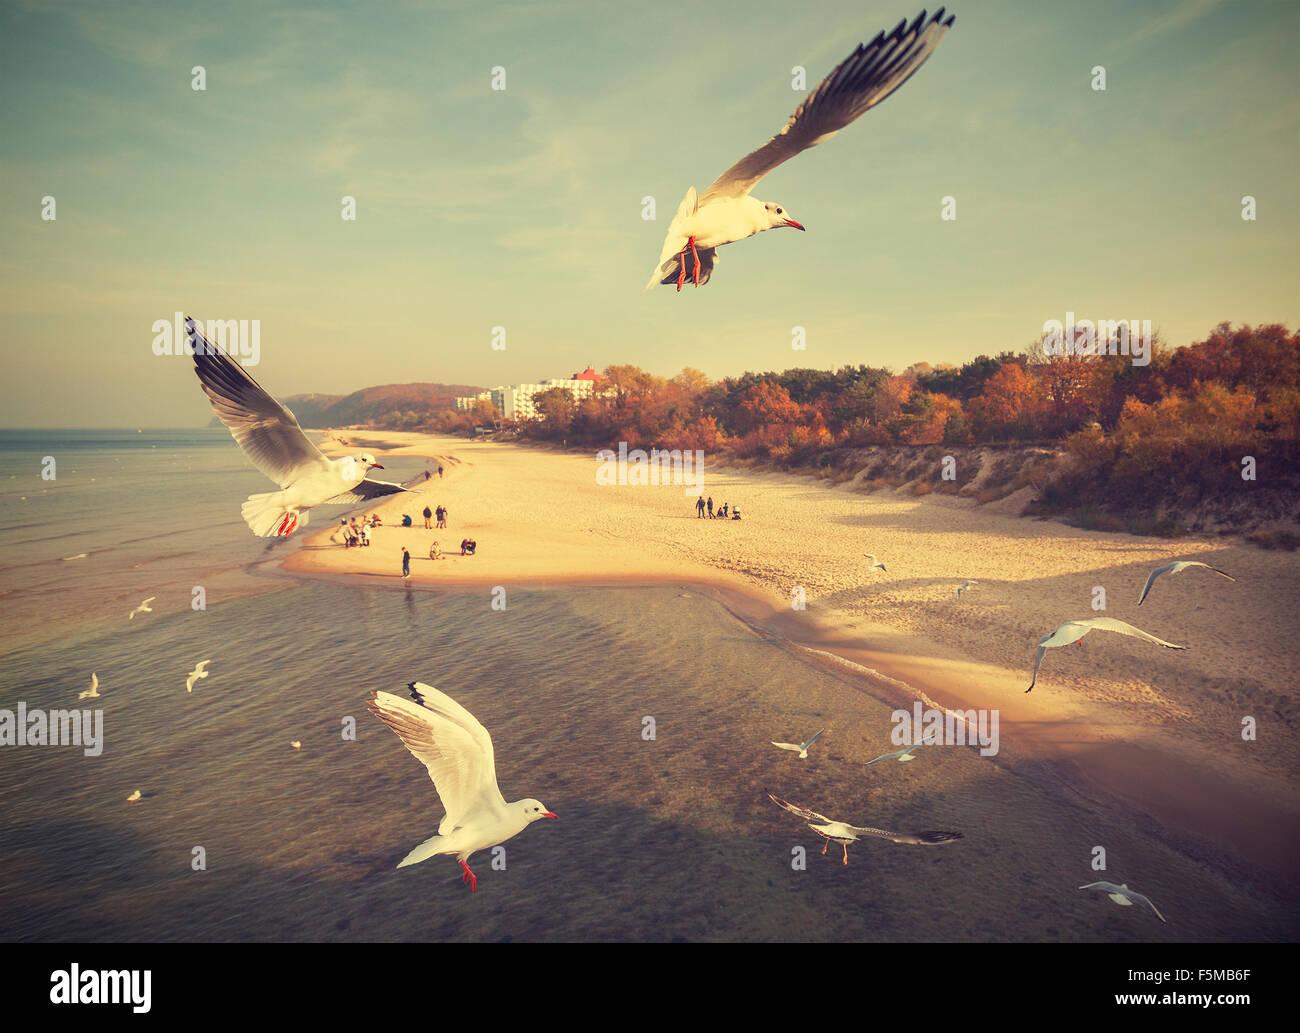 Vintage retro stylized birds above a beach, Baltic Sea, Poland. - Stock Image